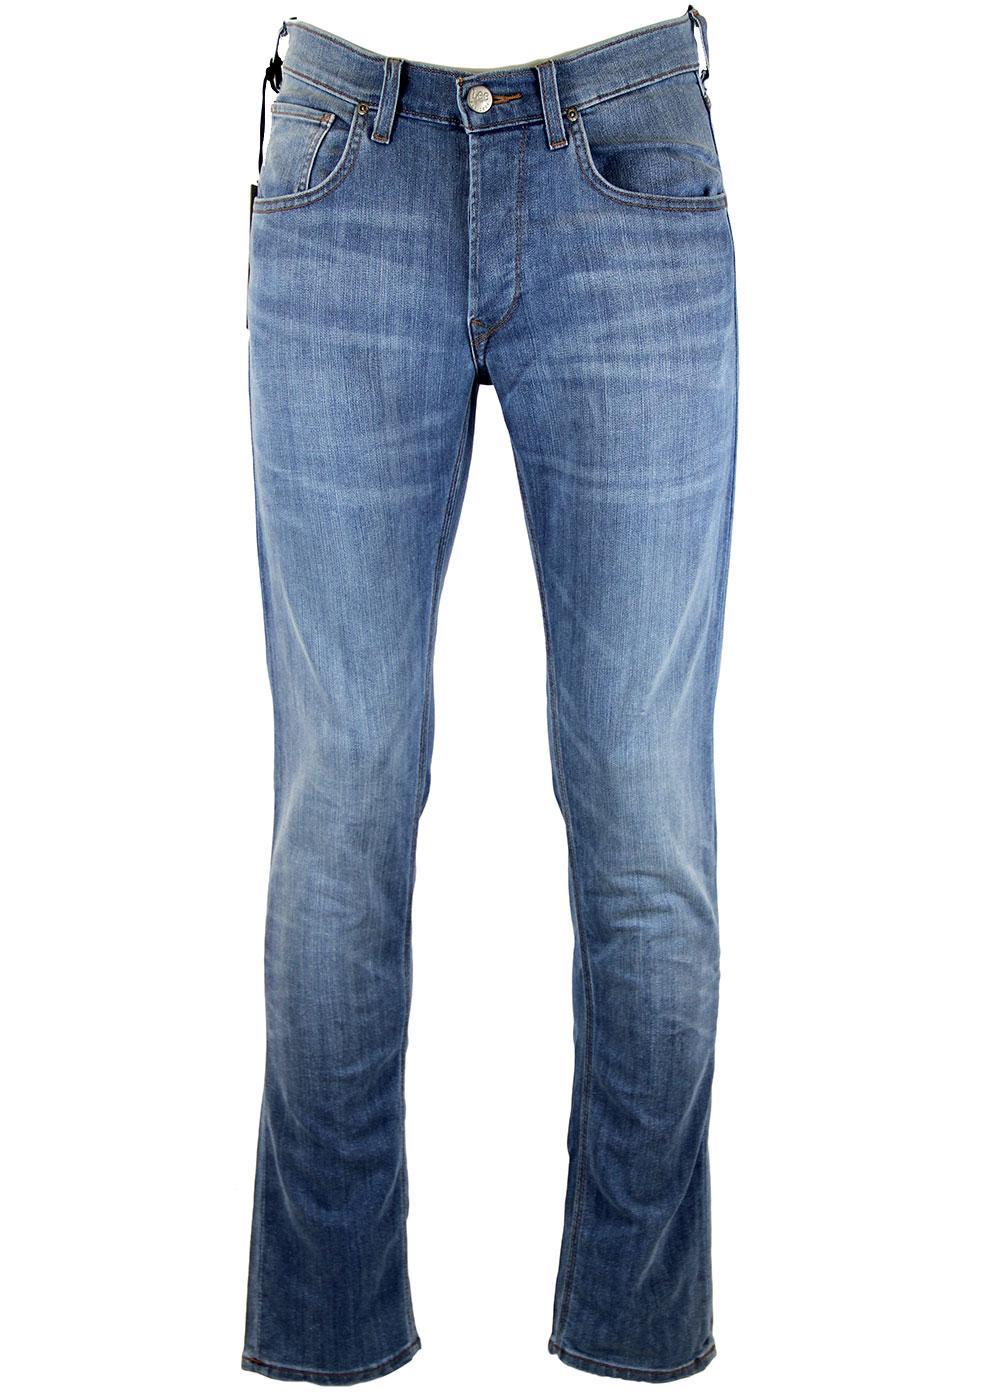 6987eb94 LEE JEANS Daren Retro Mod Regular Slim Fit Jeans Water Stone